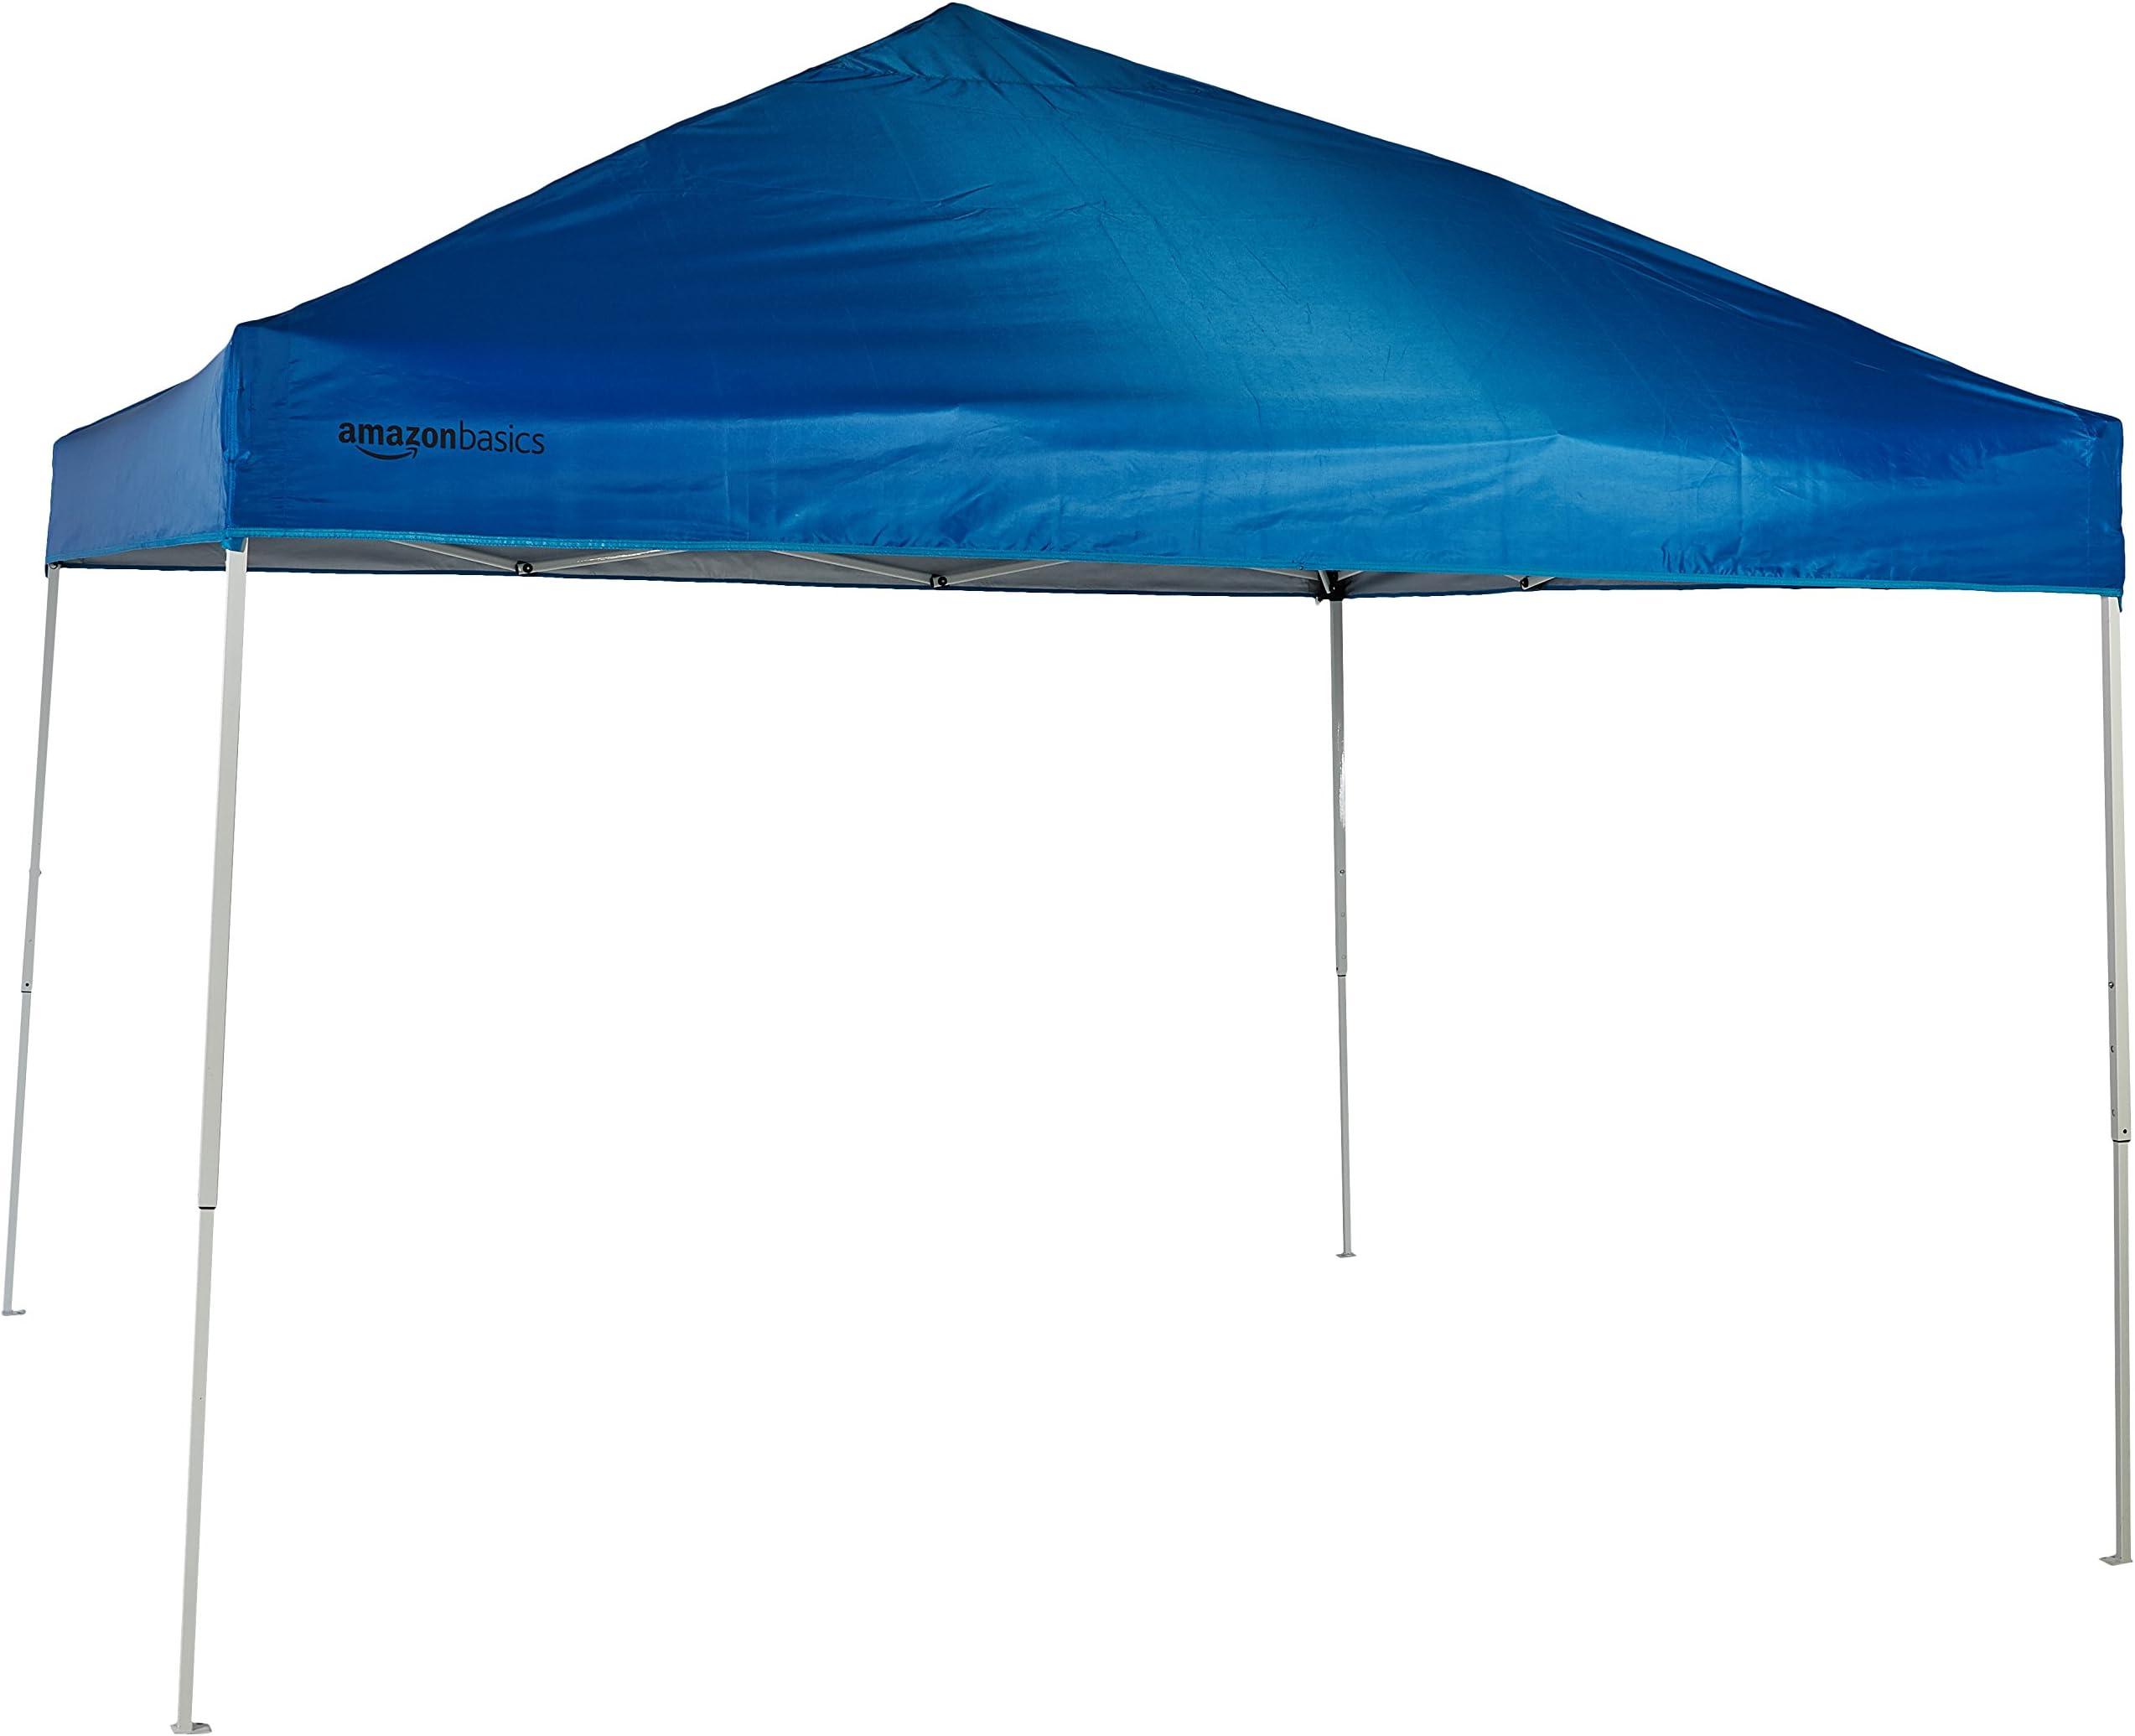 AmazonBasics Pop-Up Canopy Tent - 10u0027 x ...  sc 1 st  Amazon.com & Amazon.com: Canopies - Canopies Gazebos u0026 Pergolas: Patio Lawn ...